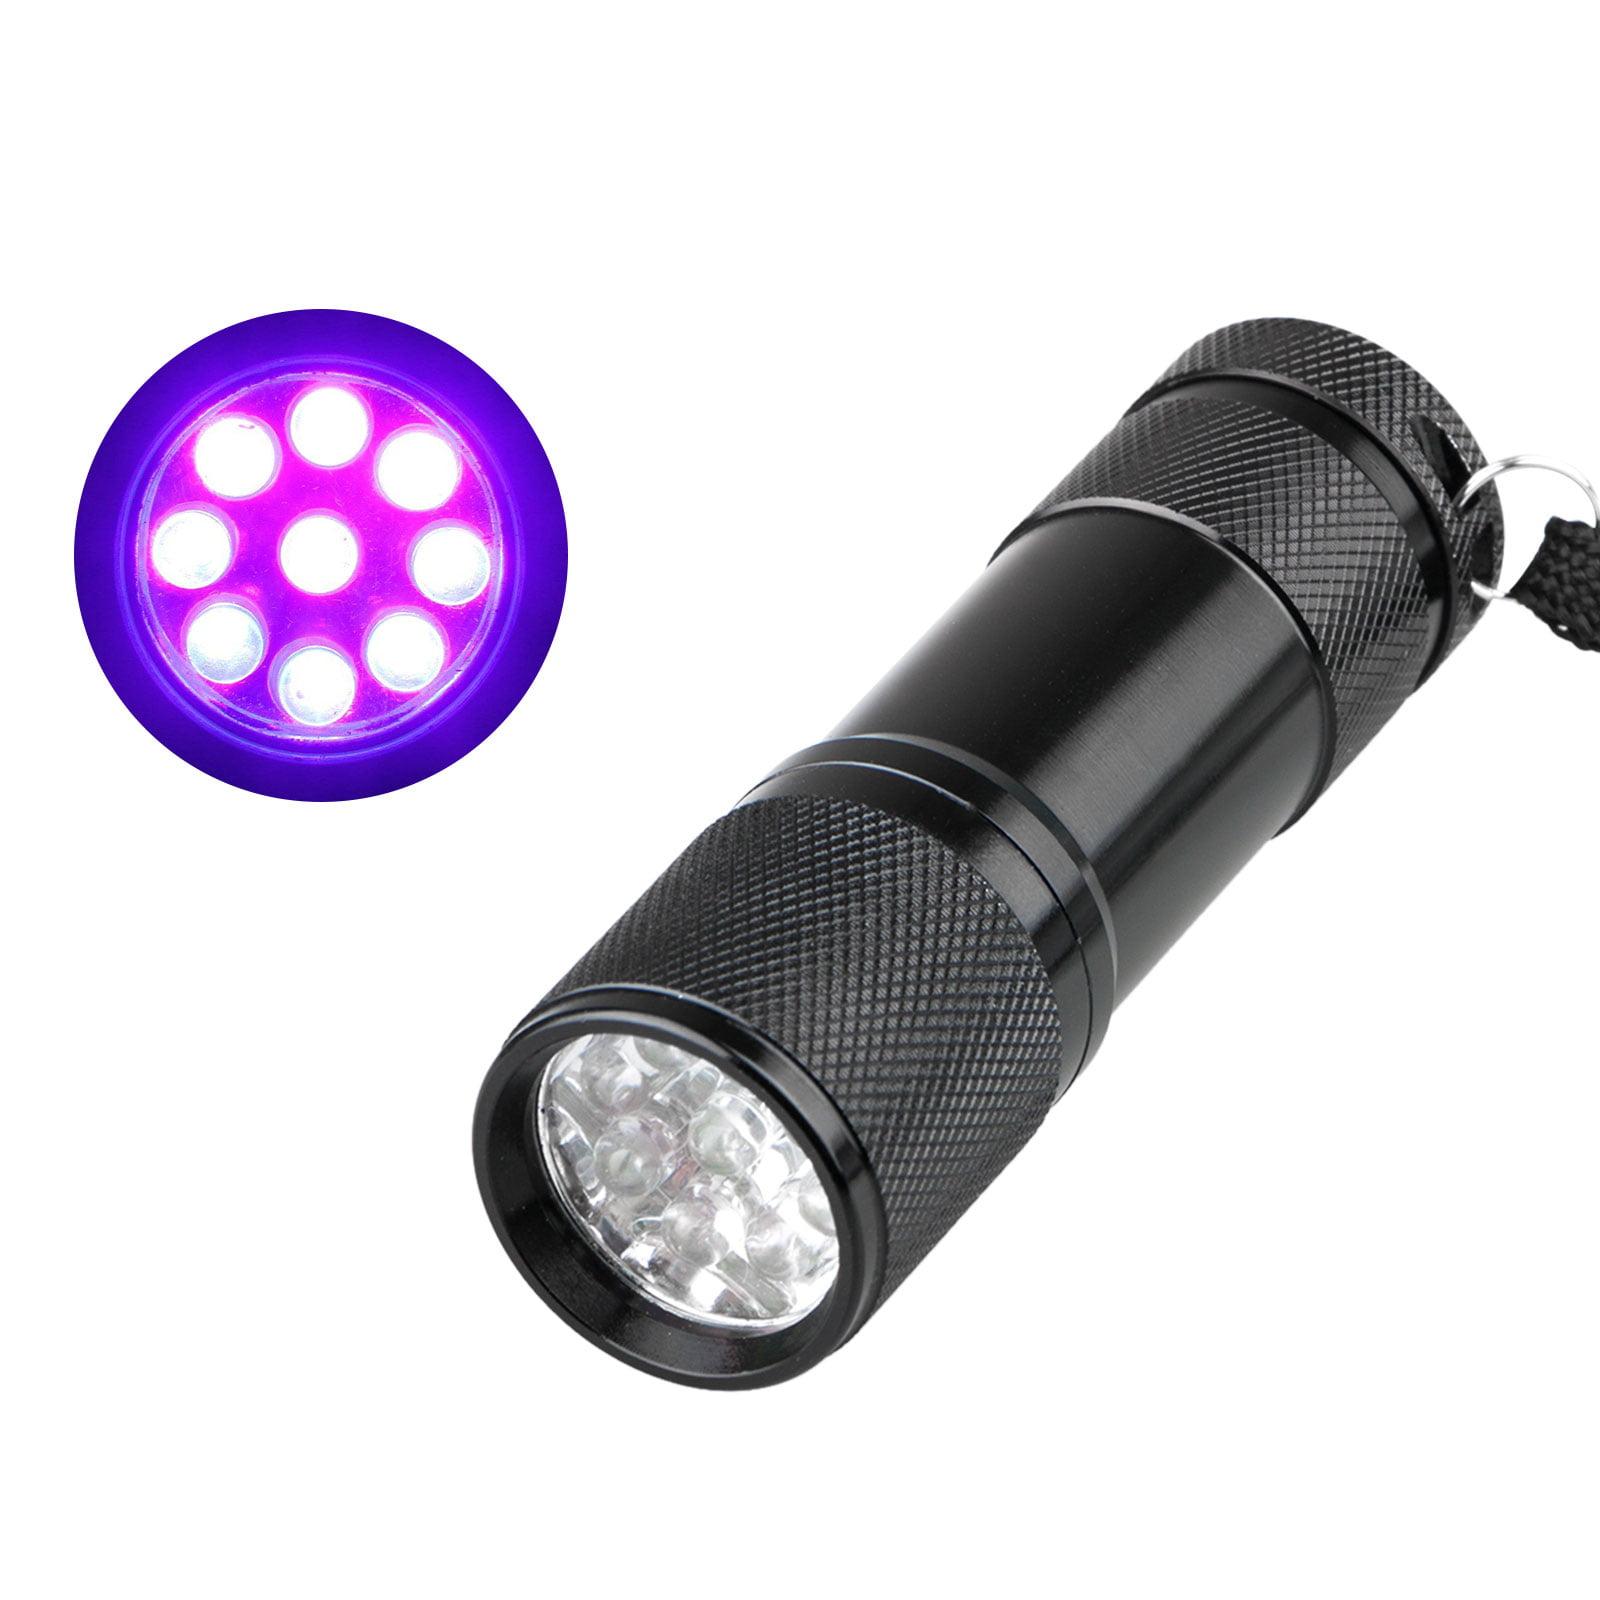 UV Flashlight Black Light, 12 LED 395 nM Ultraviolet Blacklight Detector for Dog Urine, Pet Stains Detector, Bed Bug, Hotel Room Inspection, Hunting Scorpions and Minerals